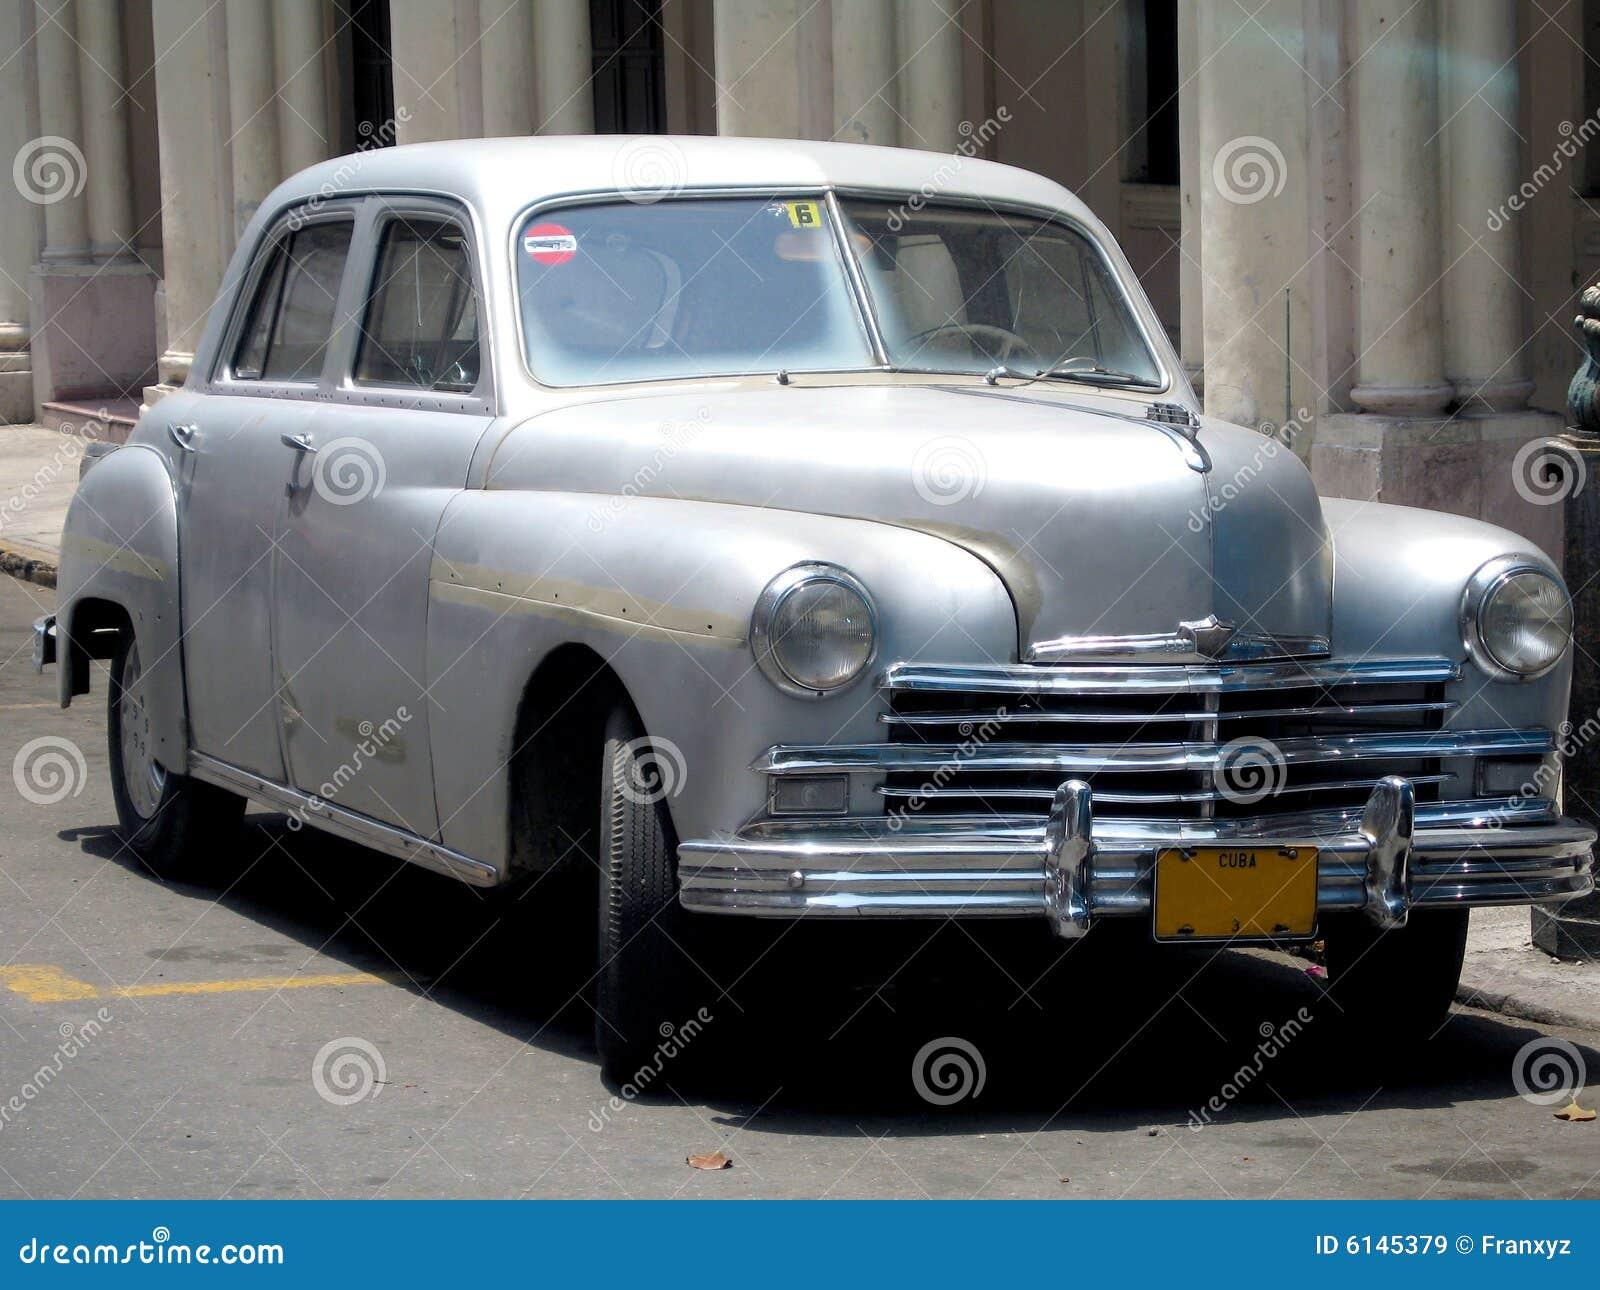 1950 silver car in Havana